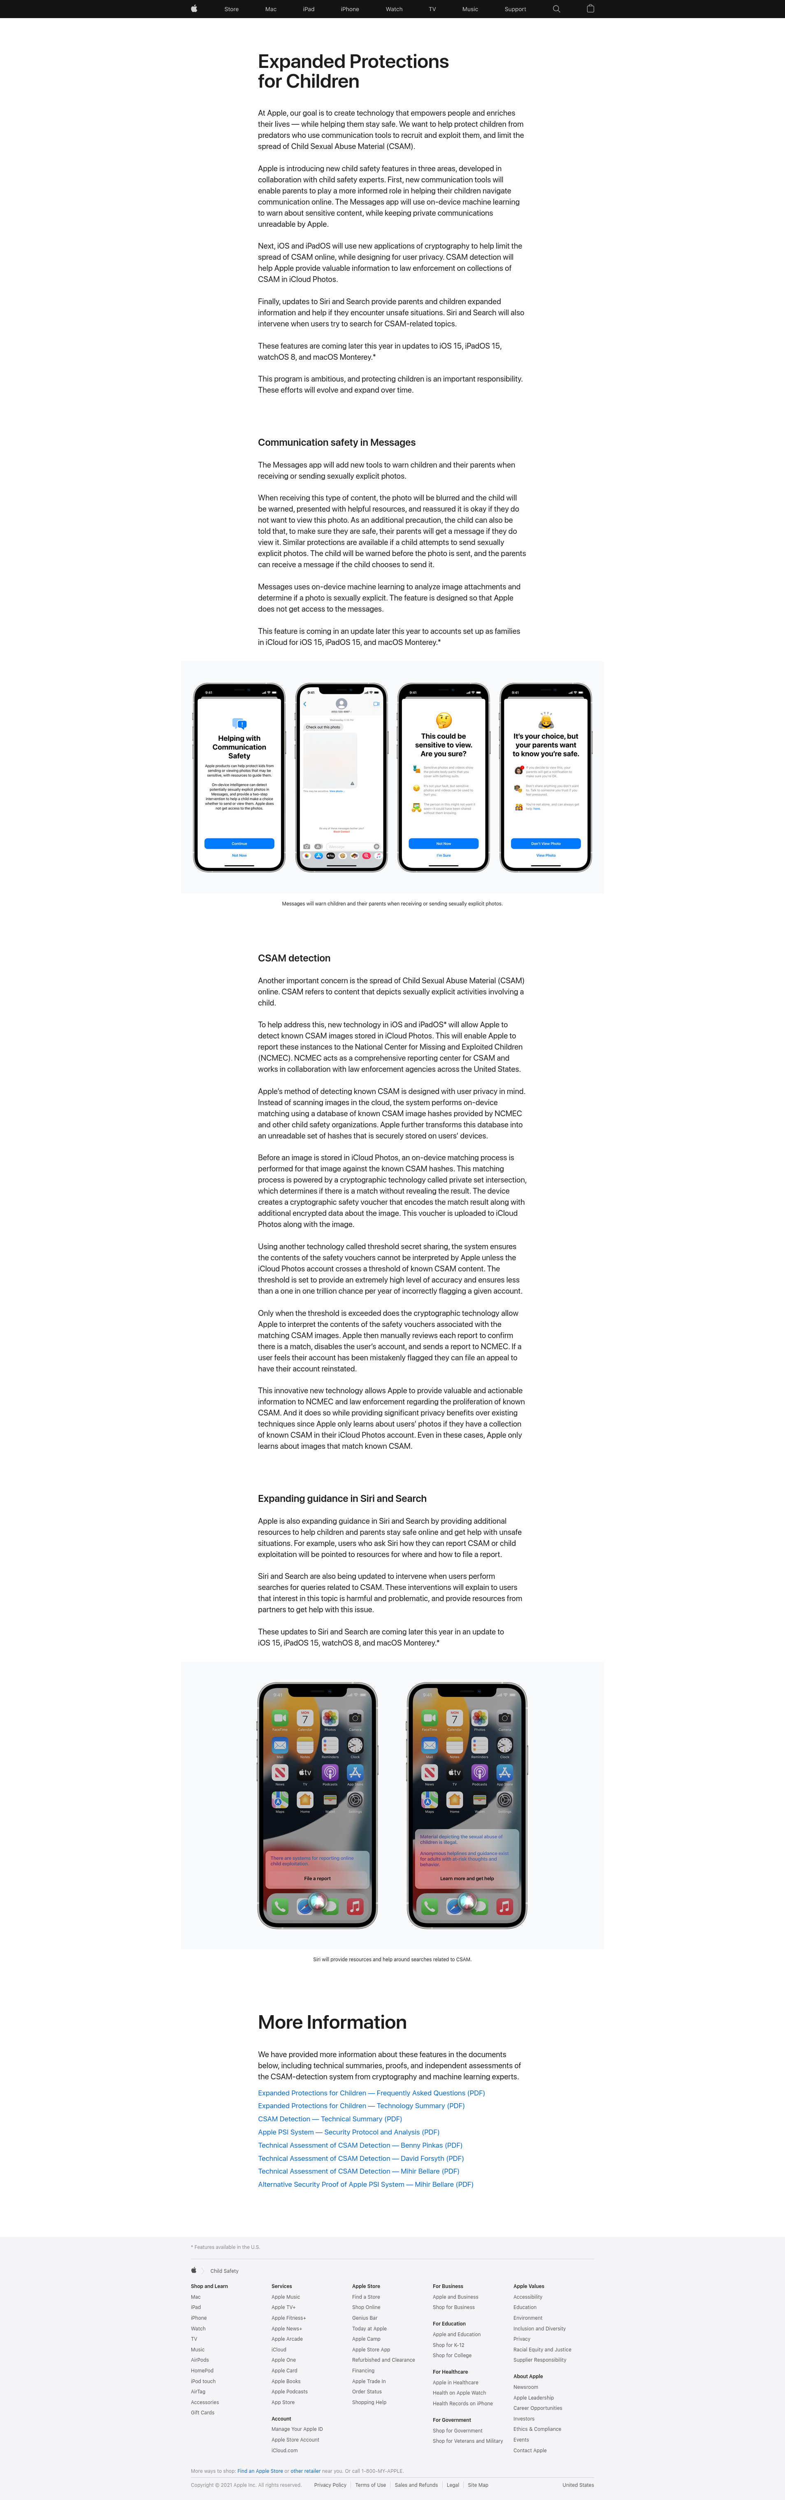 Screenshot of Apple Child Safety Statement taken on 2021-08-10